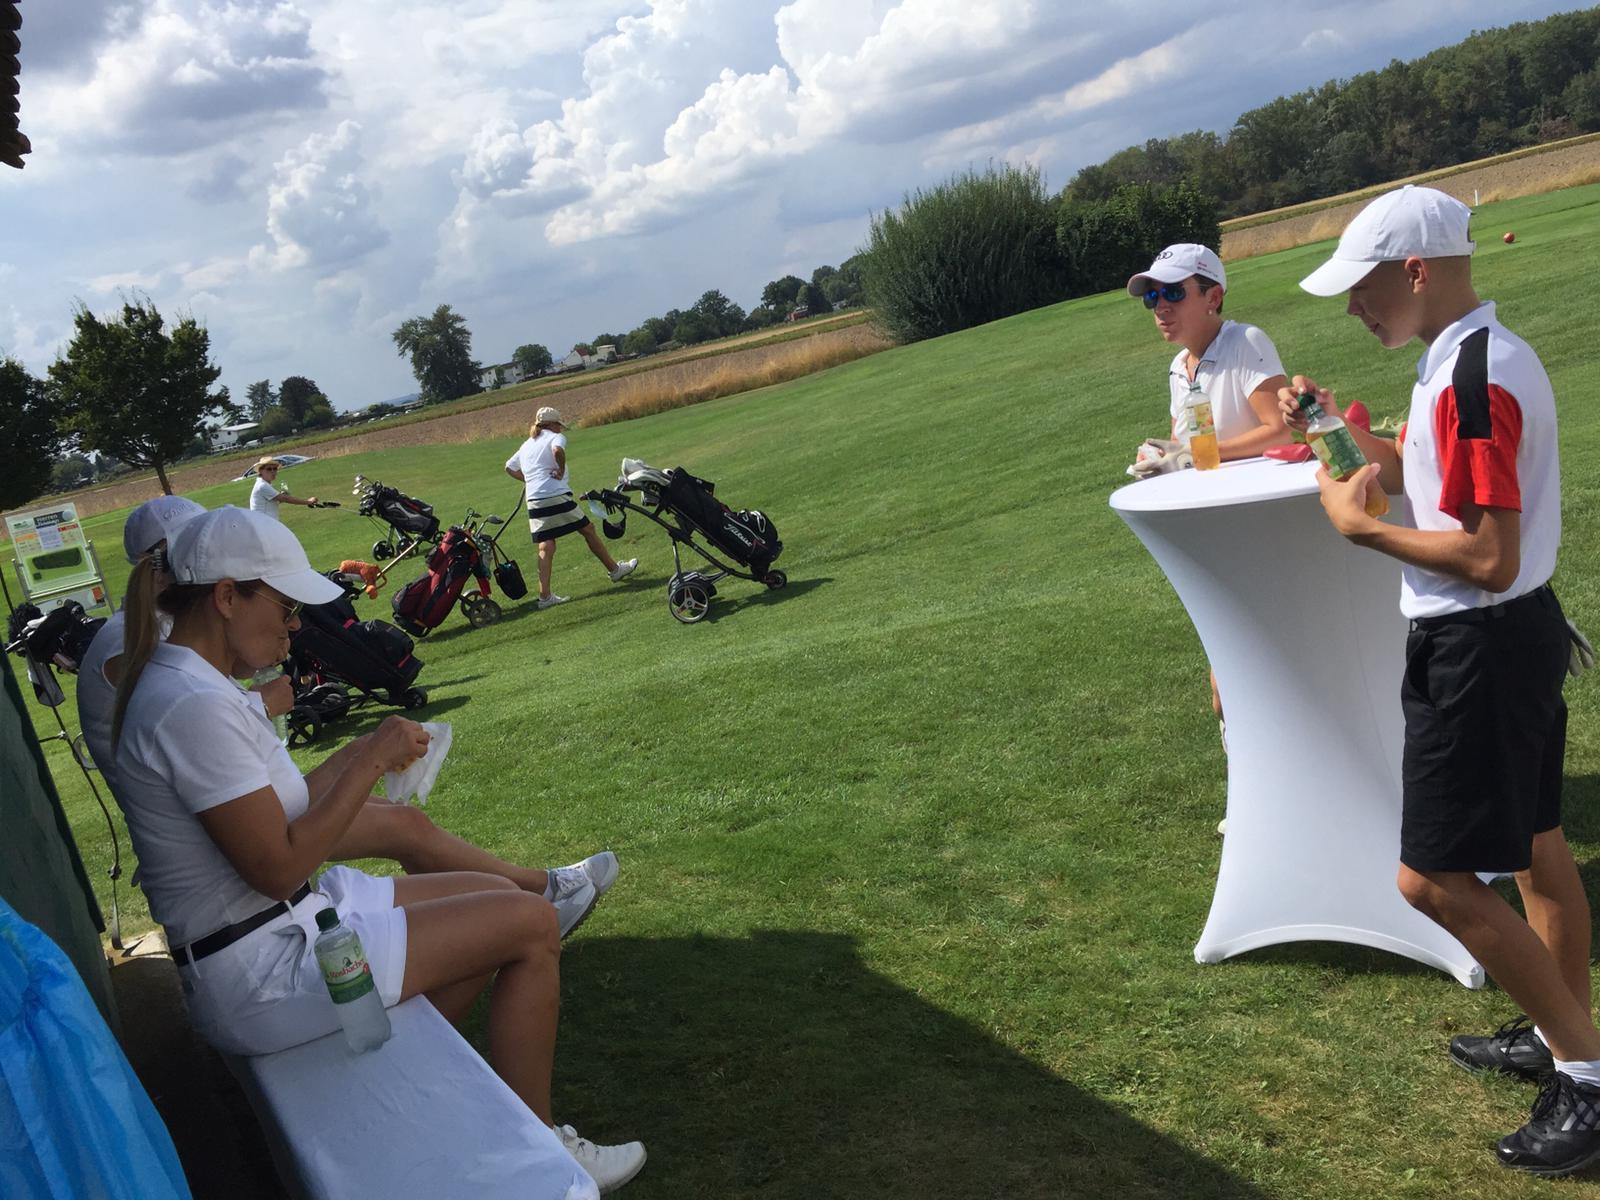 12_Golfturnier_Soroptimist_Golf_en_blanc